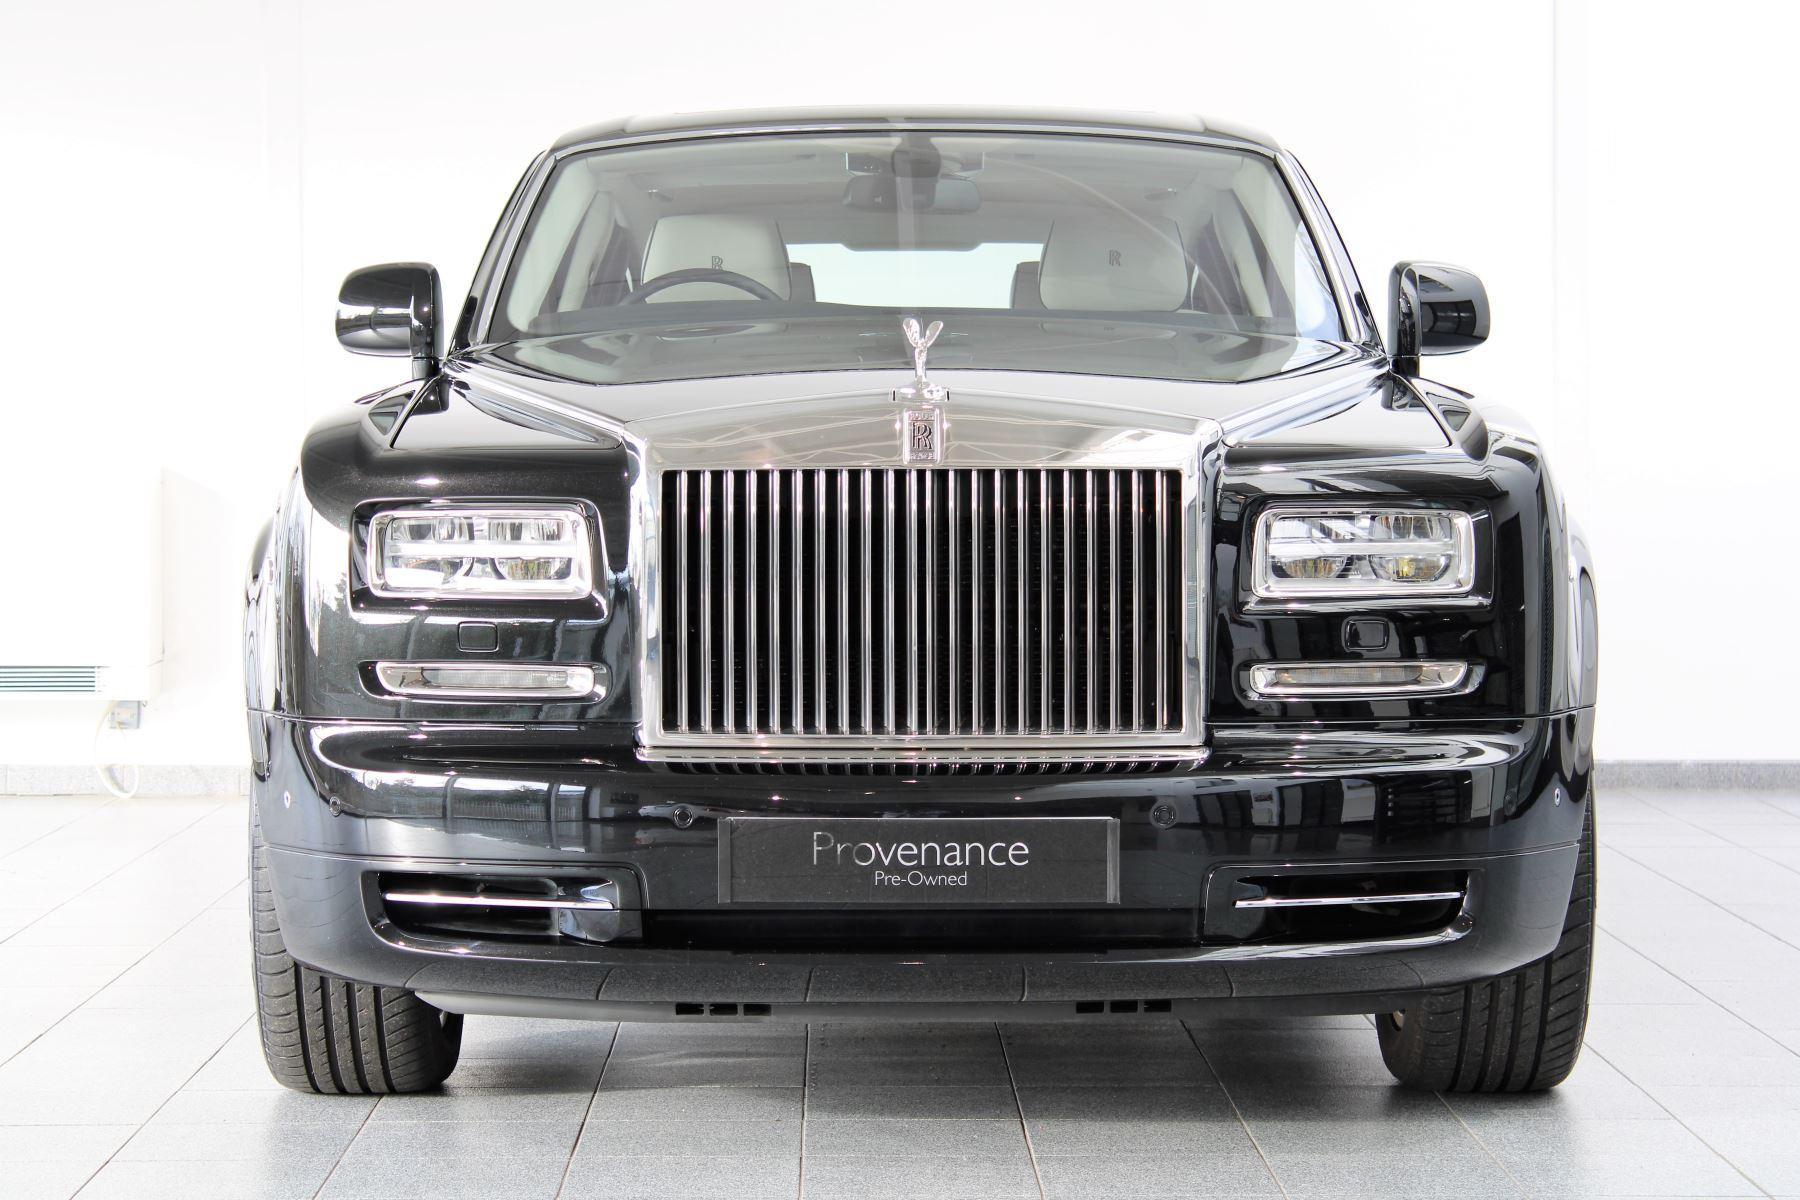 Rolls-Royce Phantom II 4dr Auto image 2